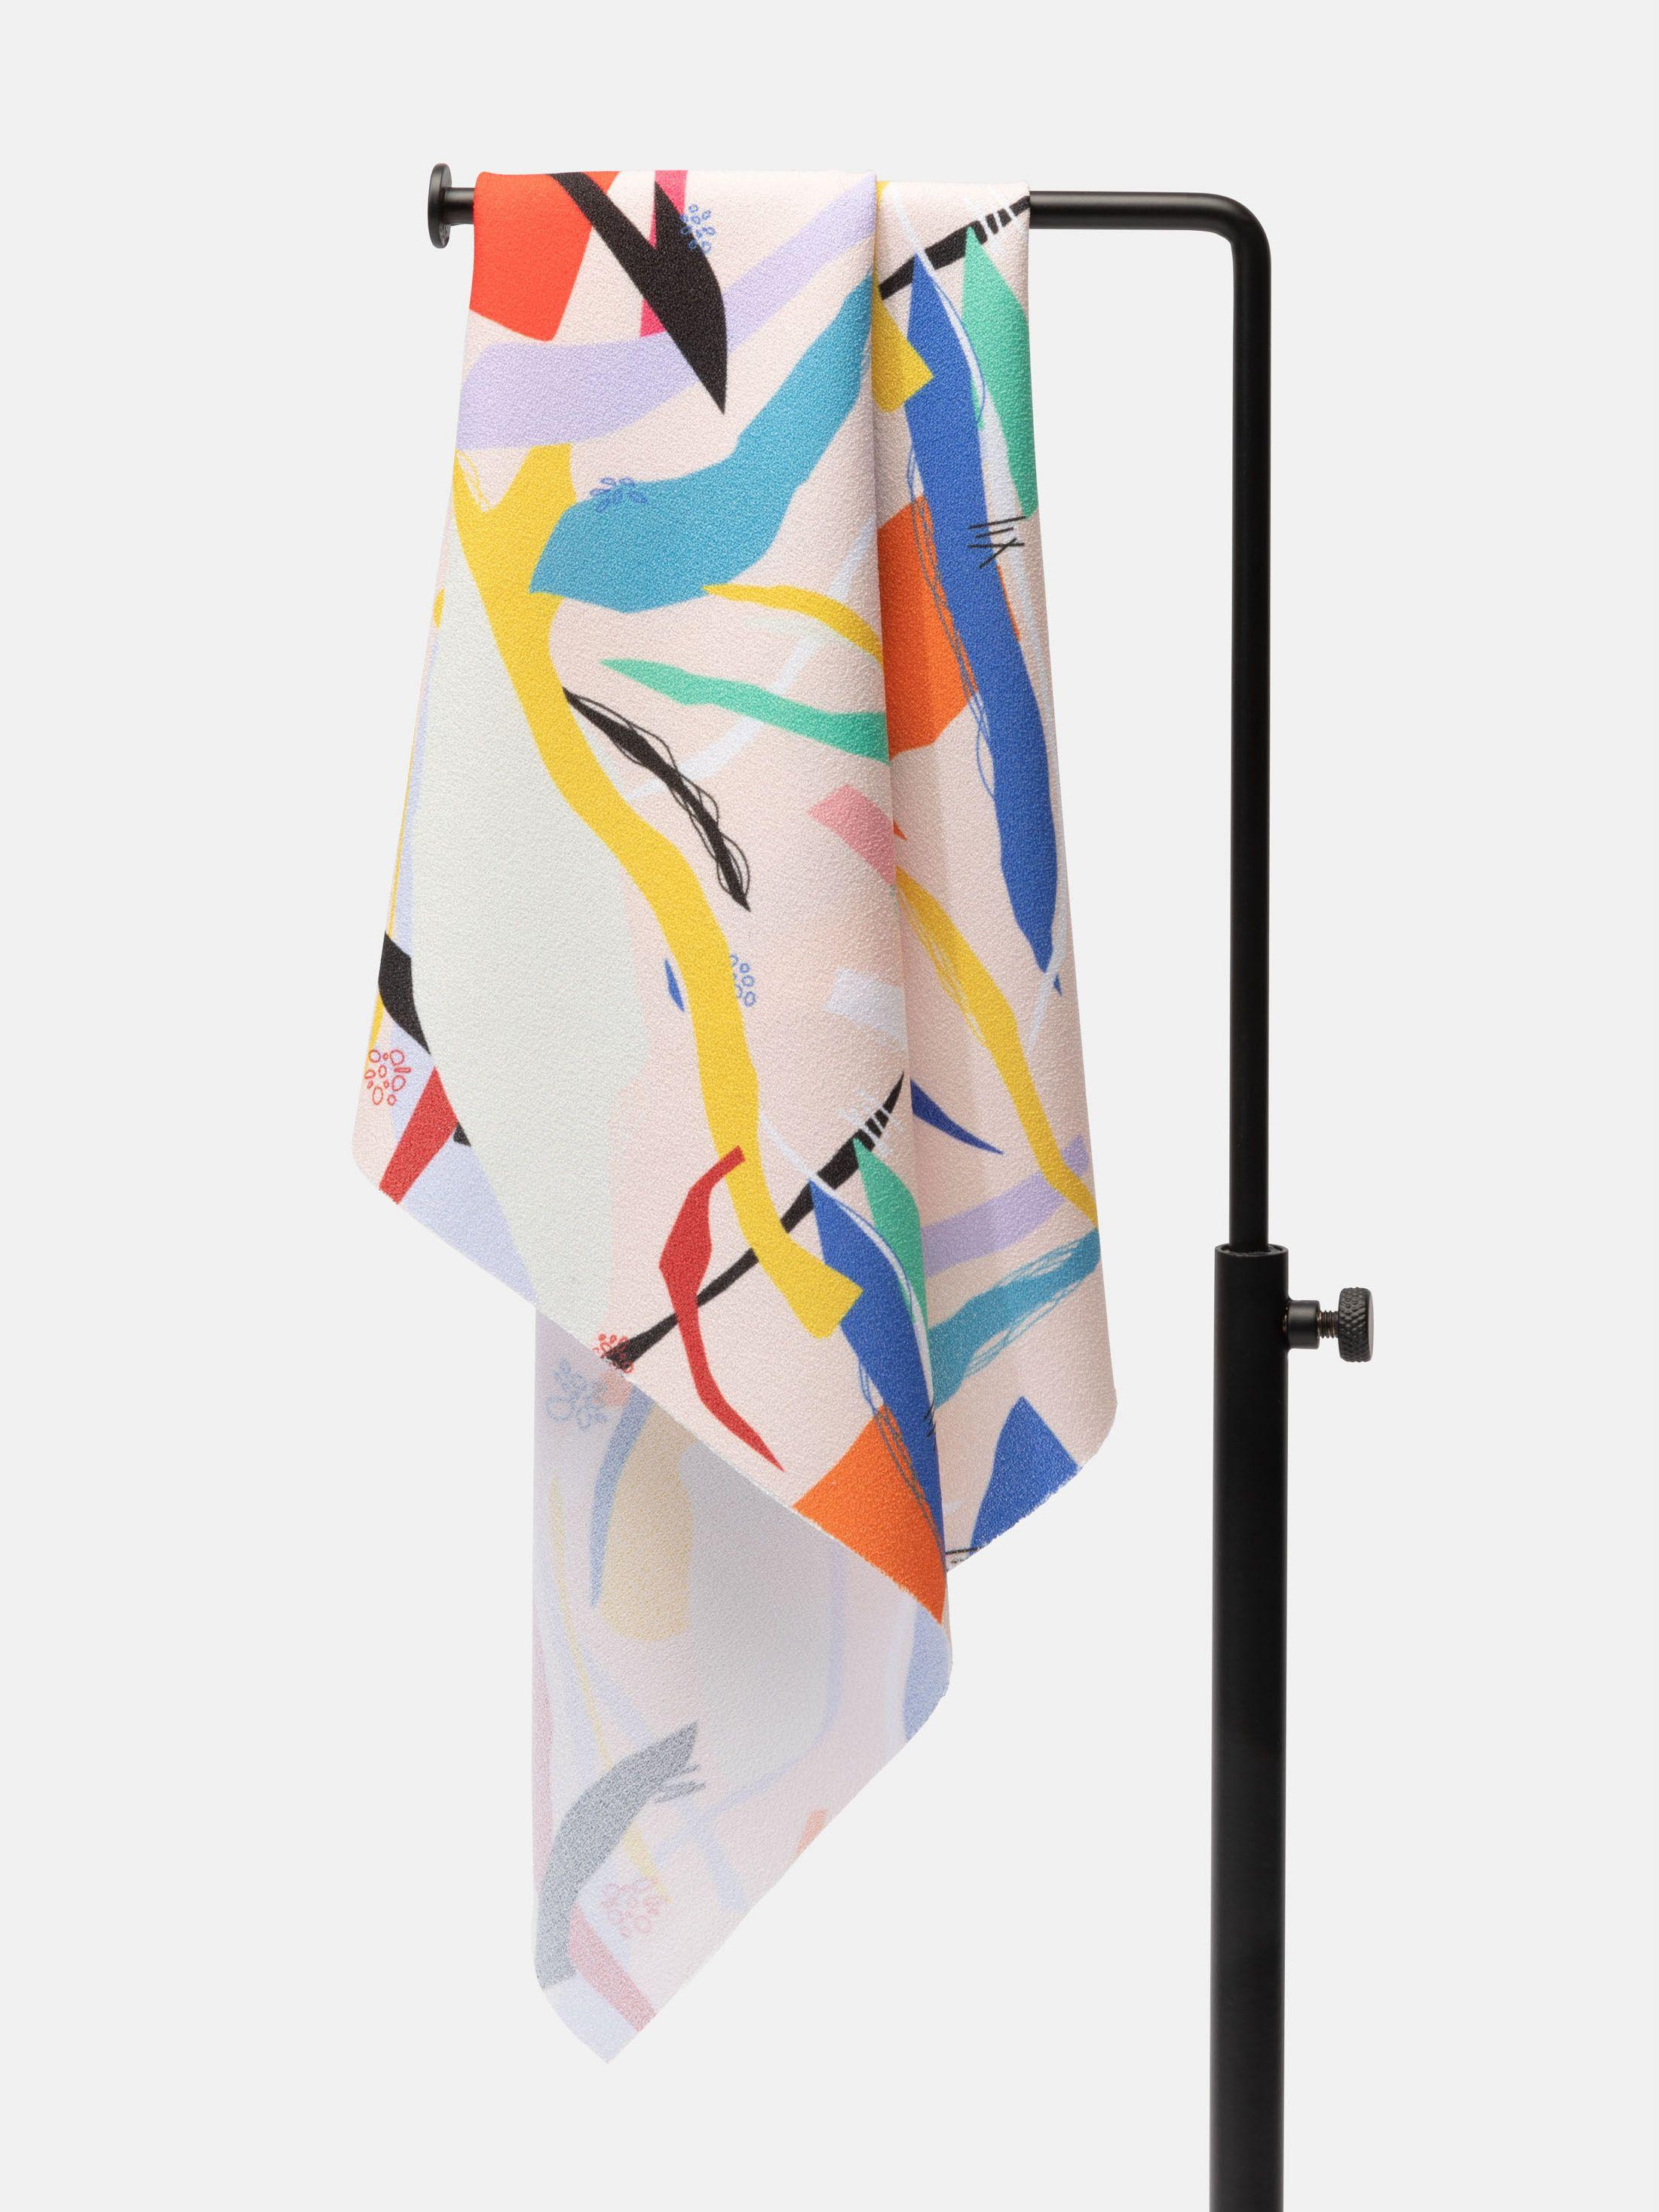 crepe fabric properties